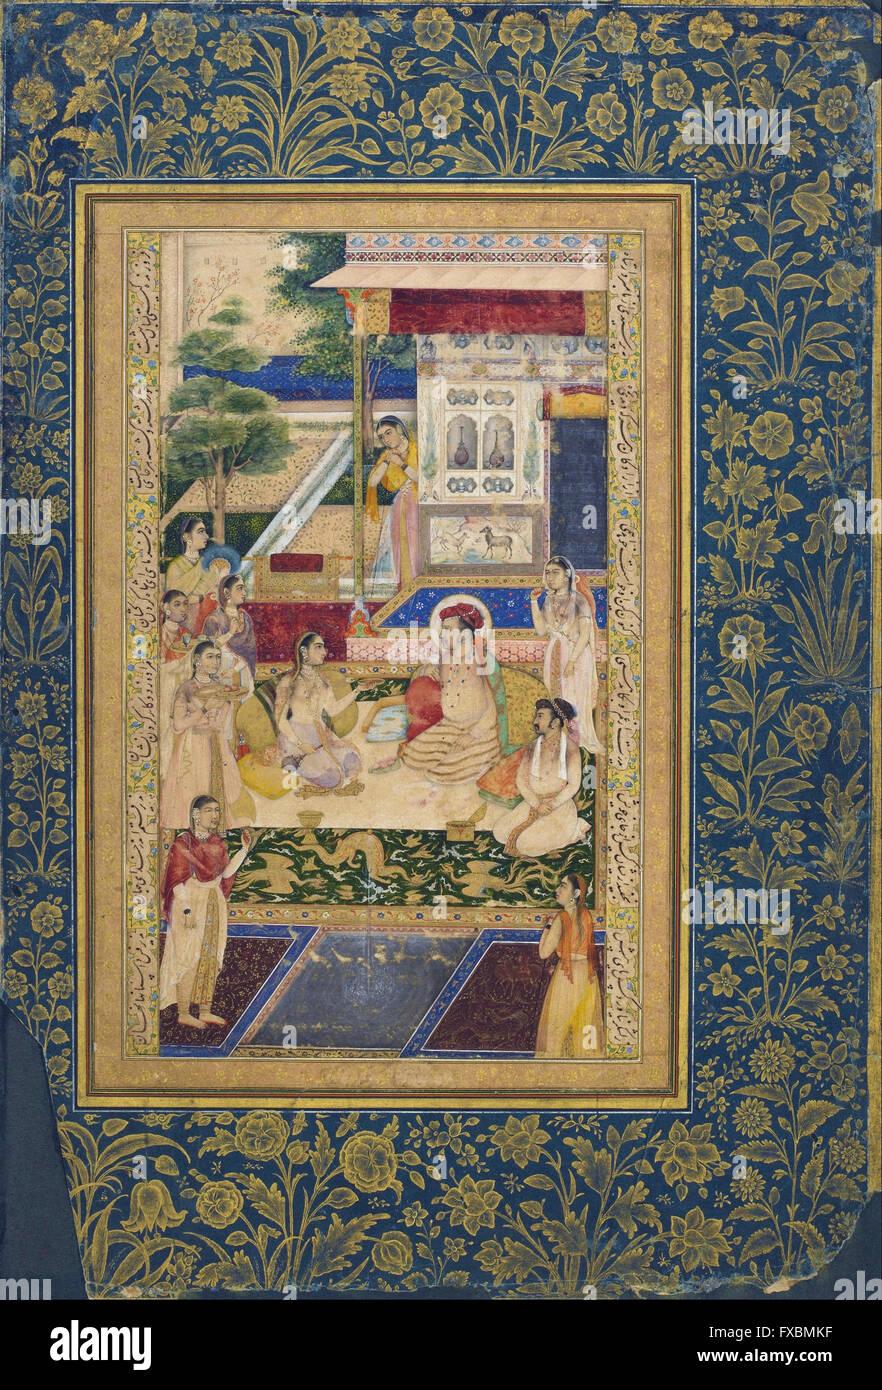 Jahangir and Prince Khurram feasted by Nur Jahan -  Freer Gallery of Art - Stock Image